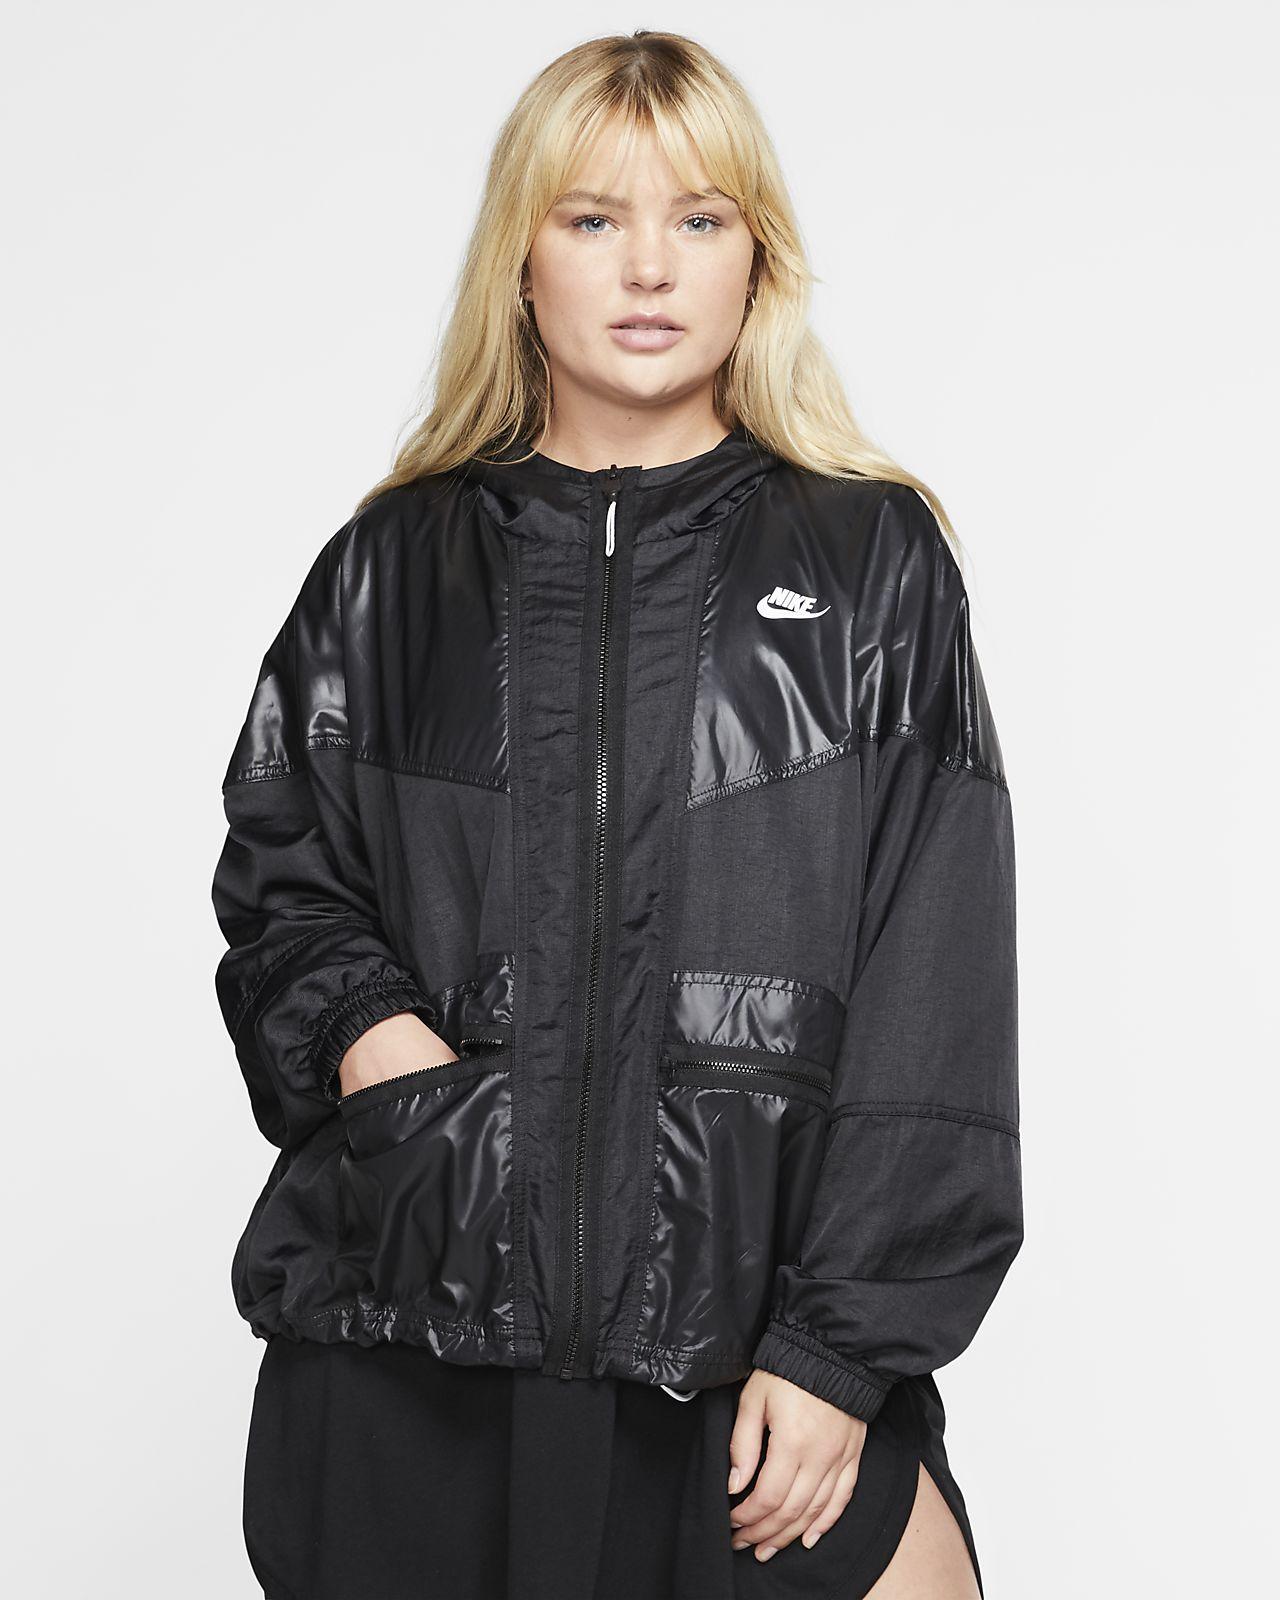 Женская куртка карго Nike Sportswear Windrunner (большие размеры)